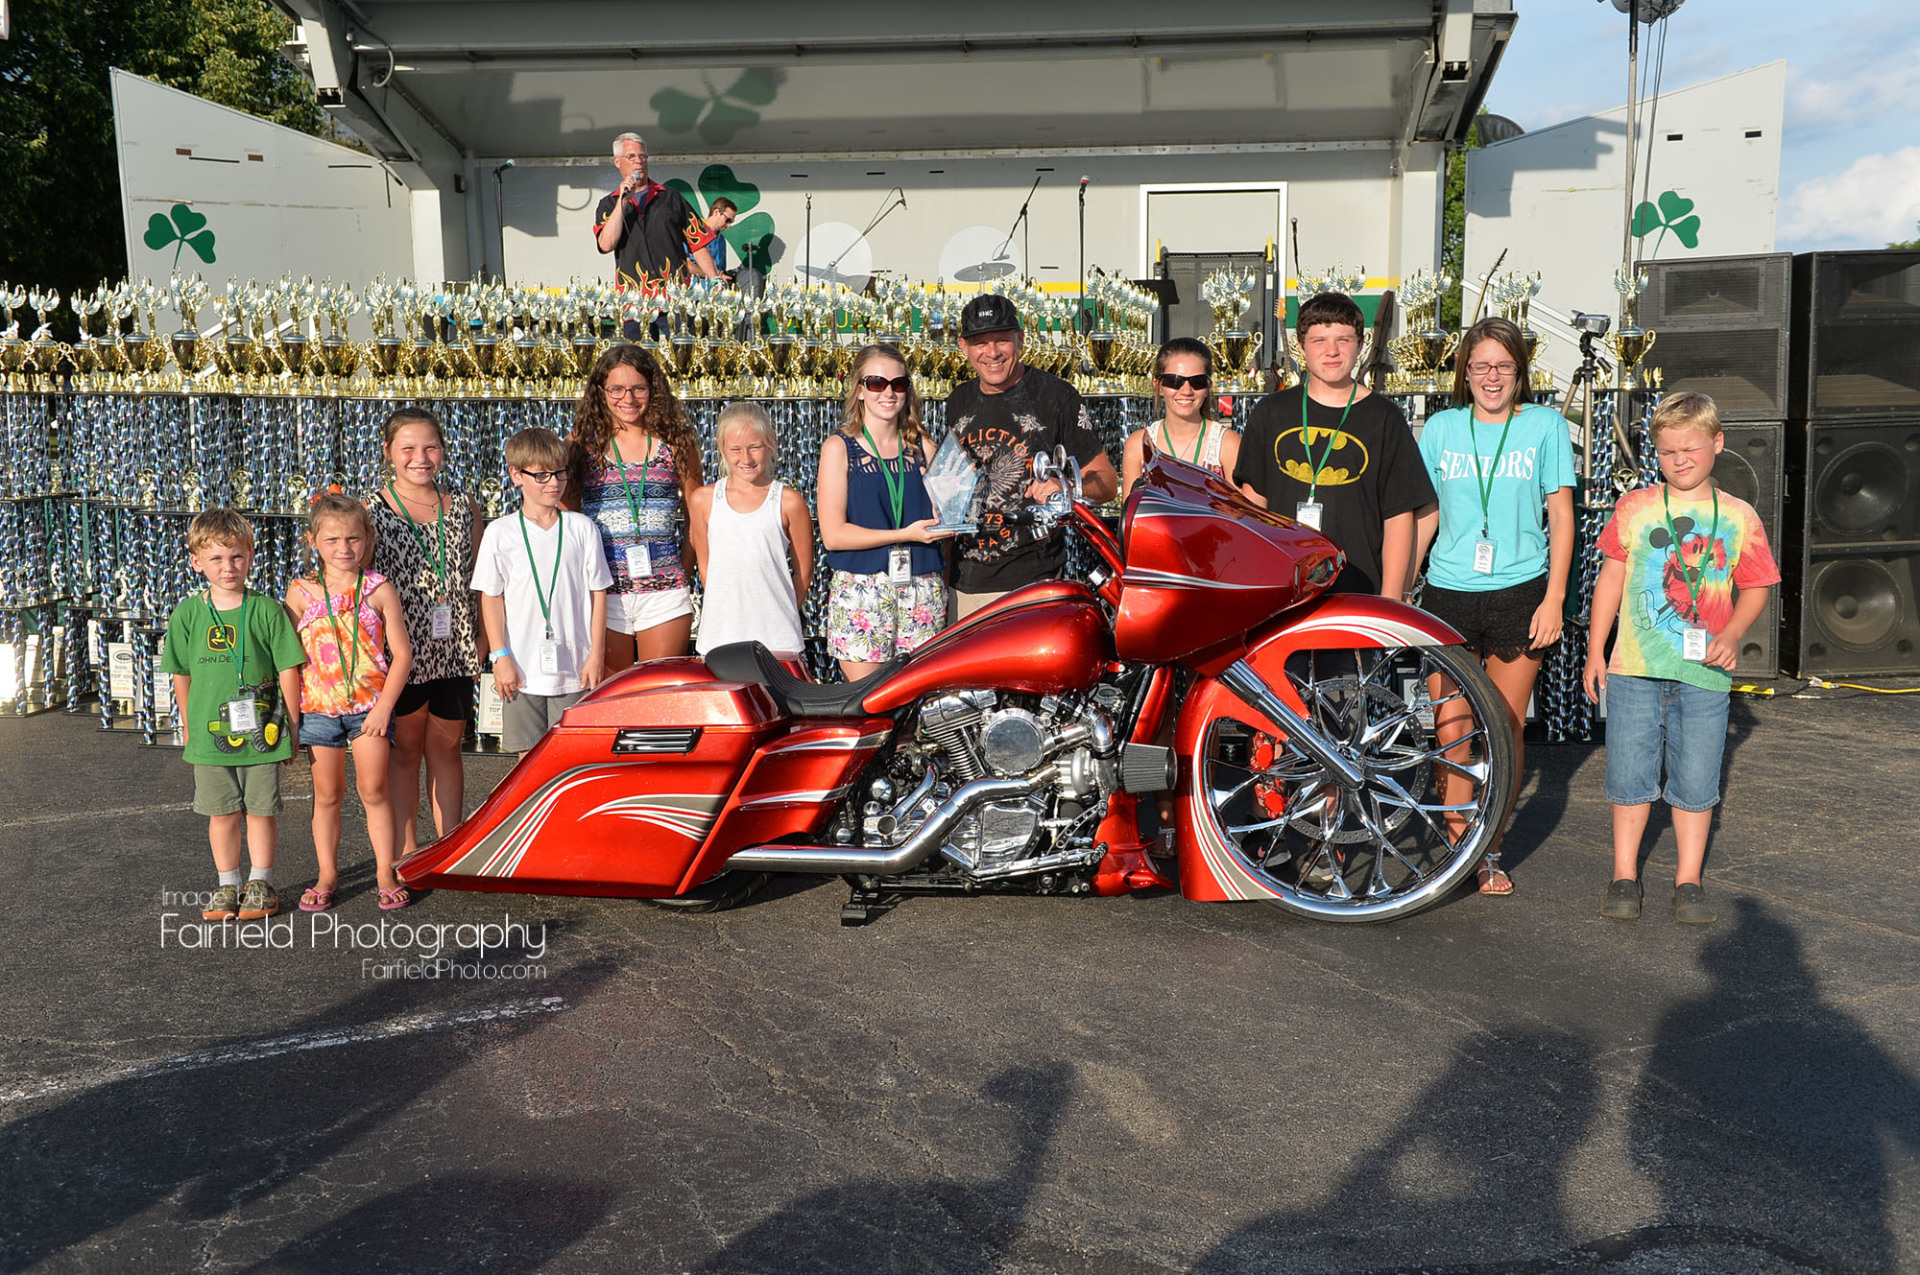 30 Inch Big Wheel Bagger. Hot Bike tour winner 2016